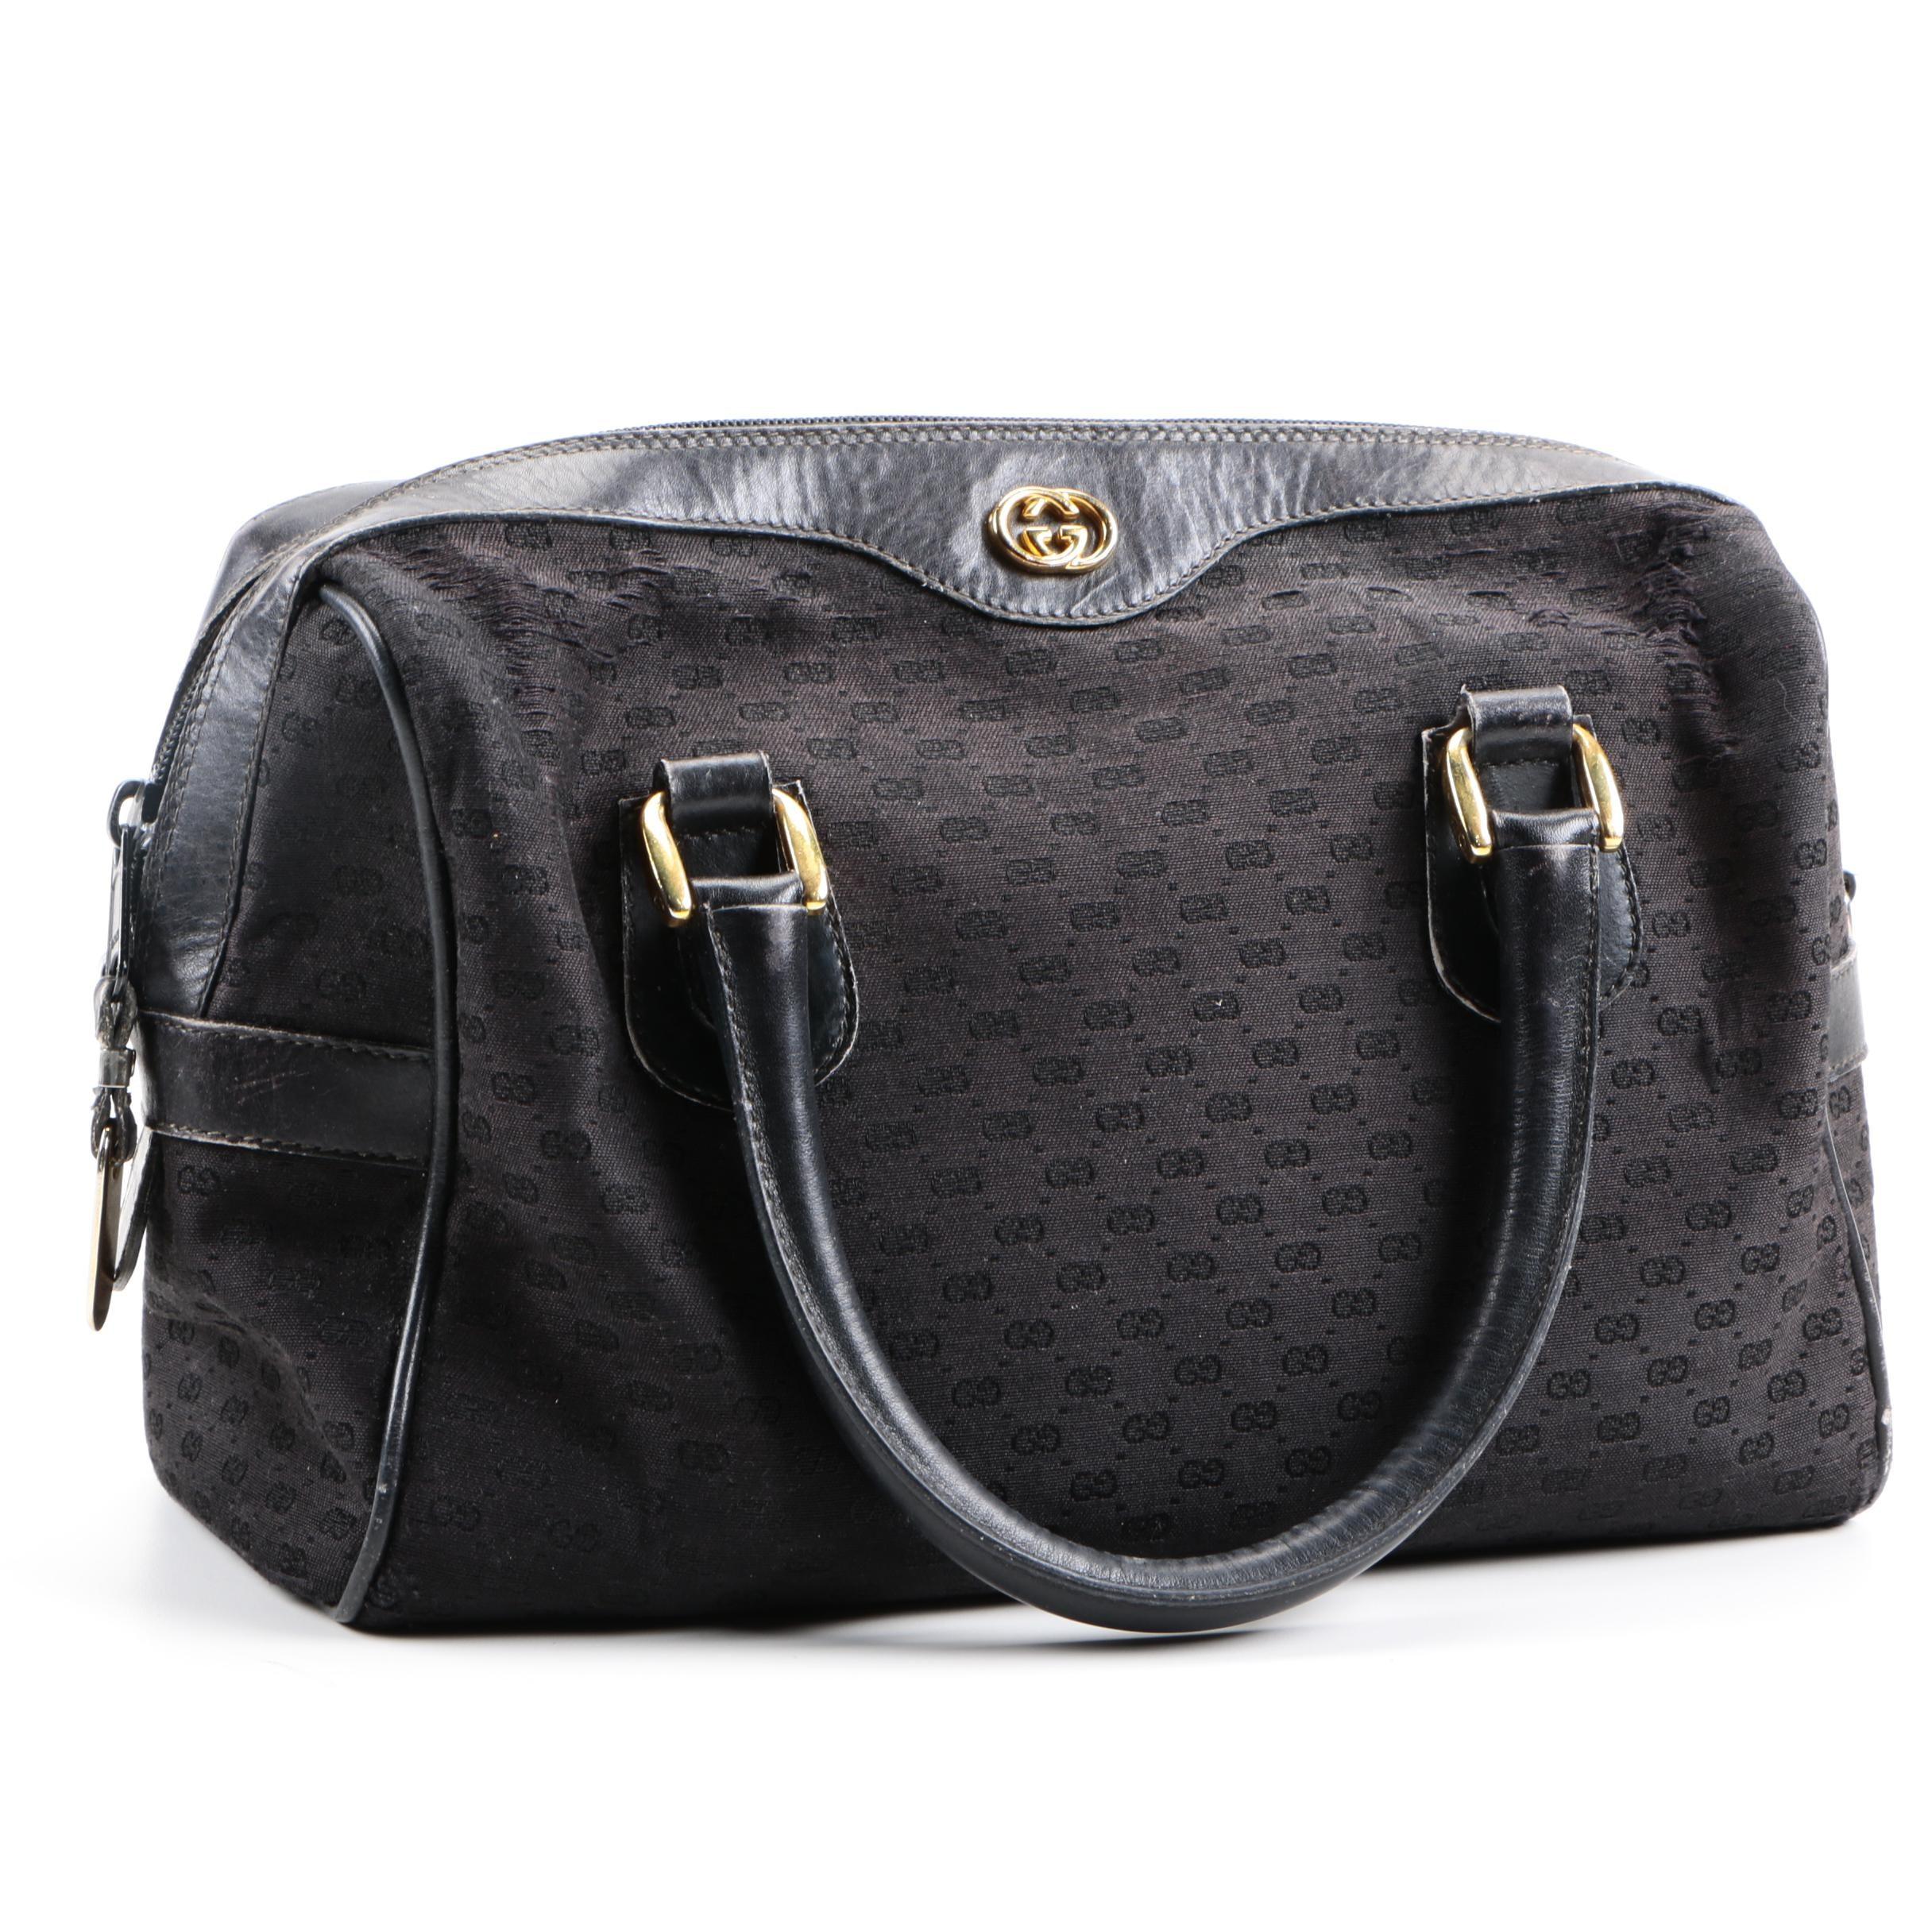 Gucci Monogram Black Canvas Bag